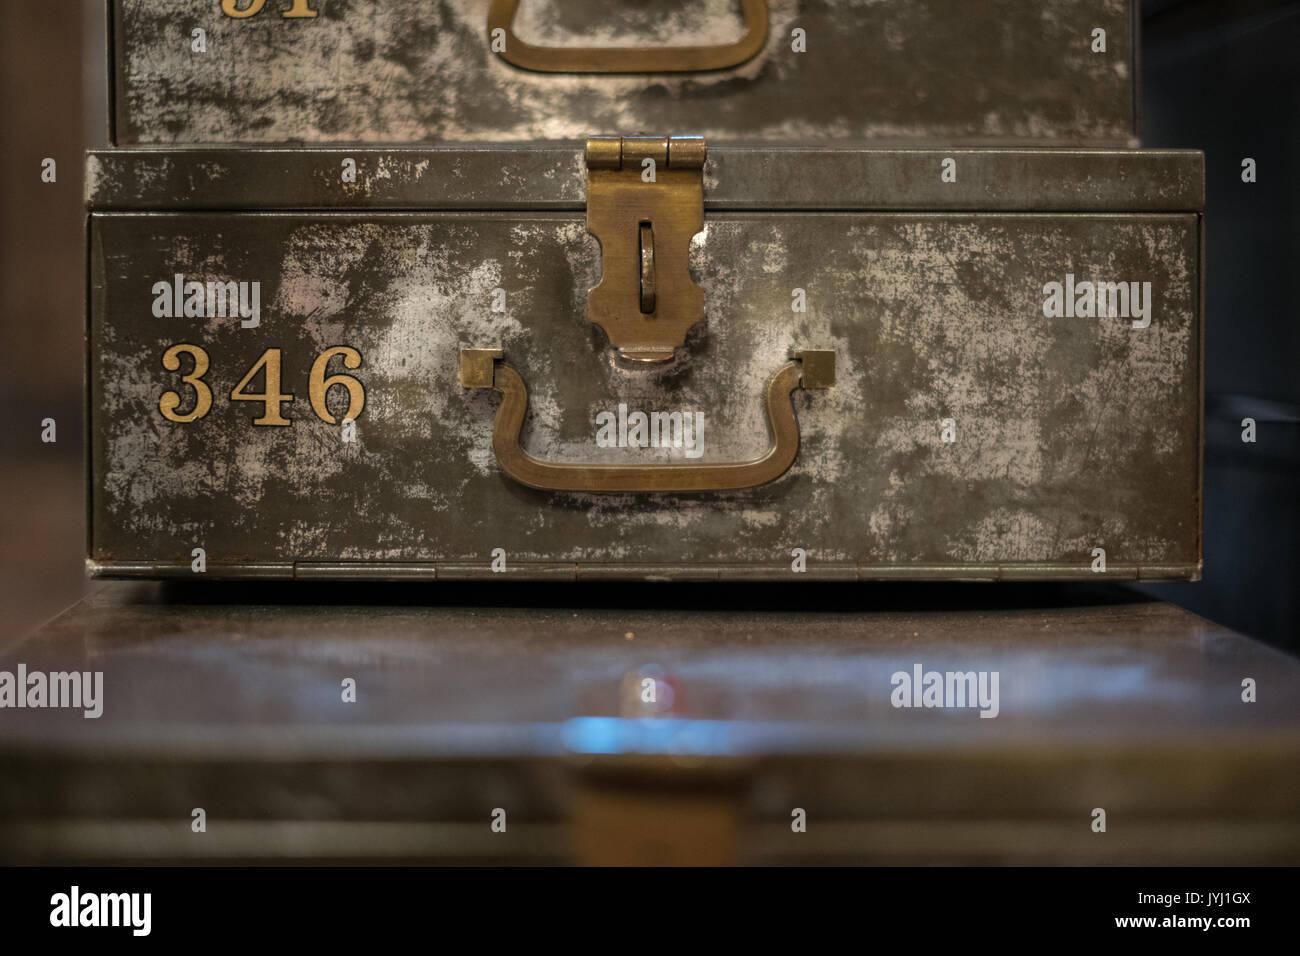 old metal lockbox, vintage money case - deposit box safe - Stock Image